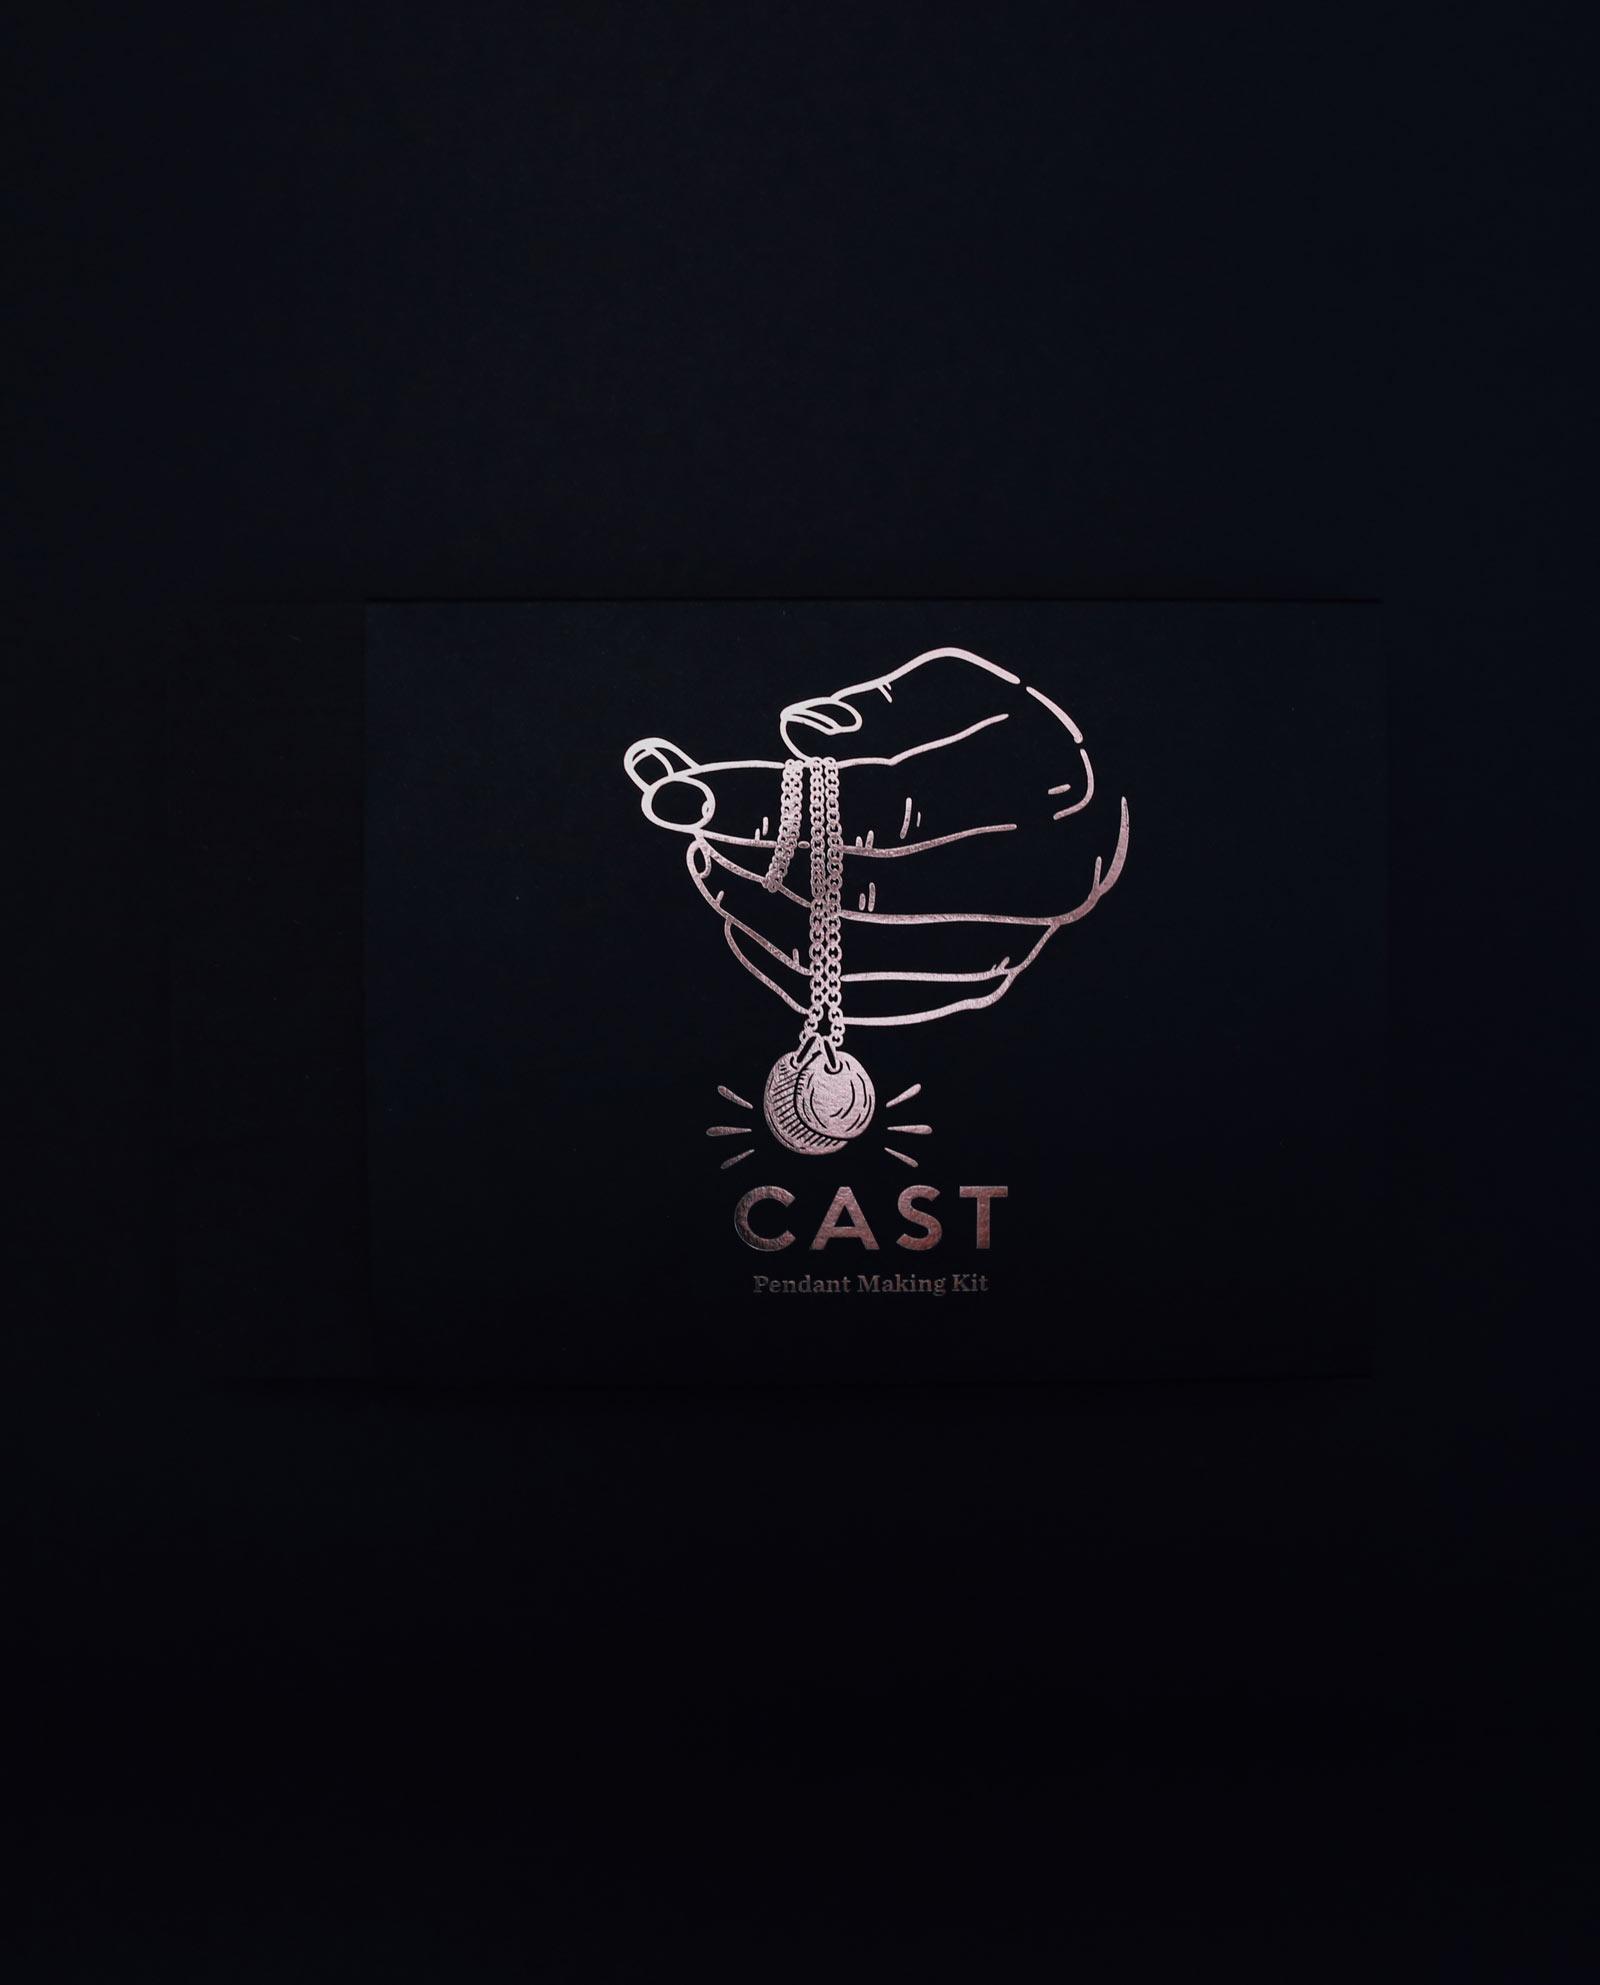 The original pendant making kit cast create bespoke jewellery aloadofball Gallery